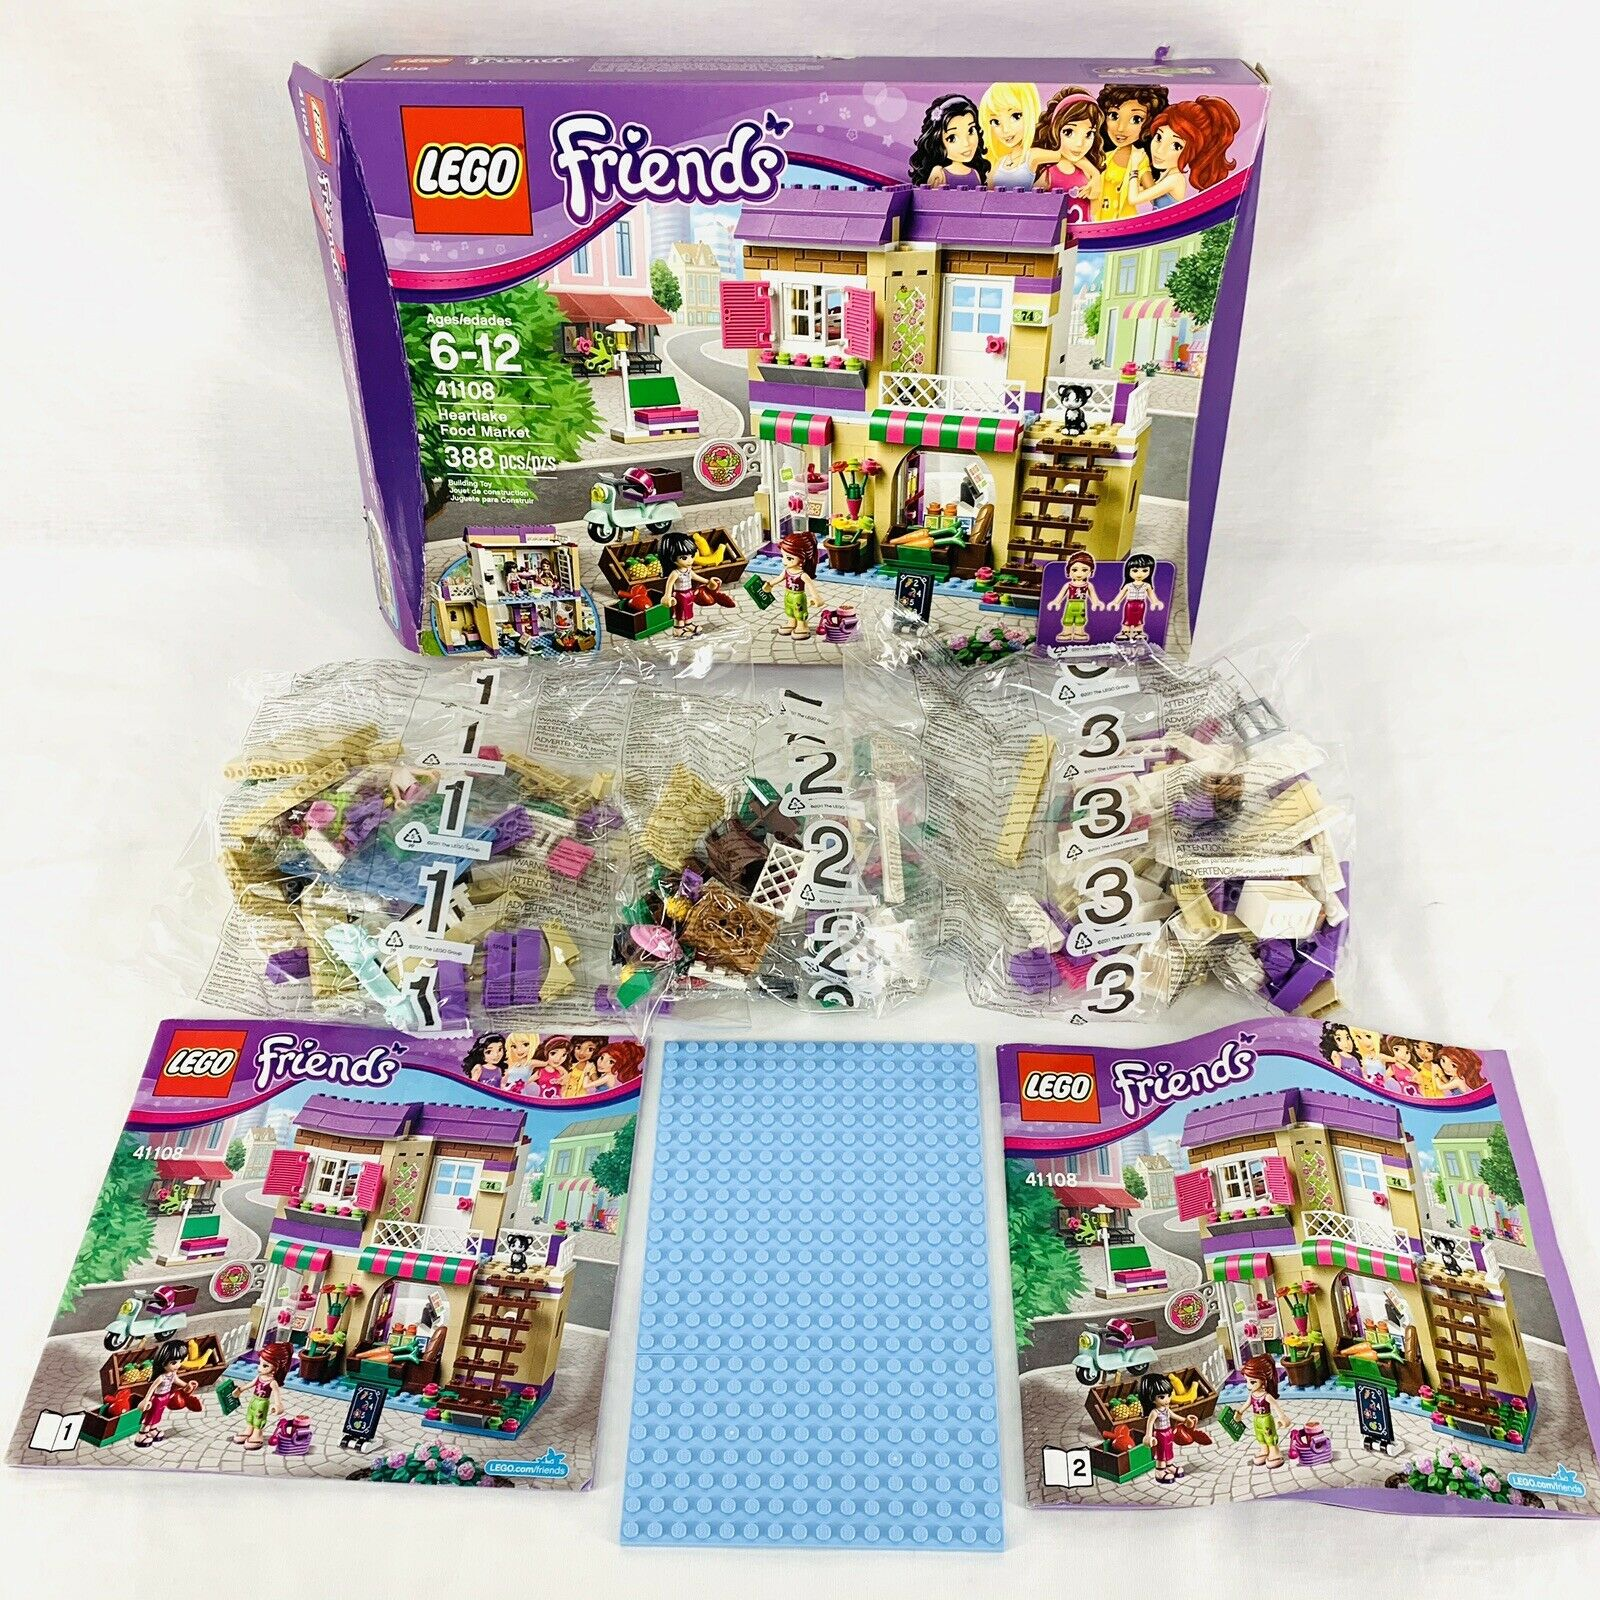 41108 FRND131 R1172 LEGO Friends Mini Figure Maya